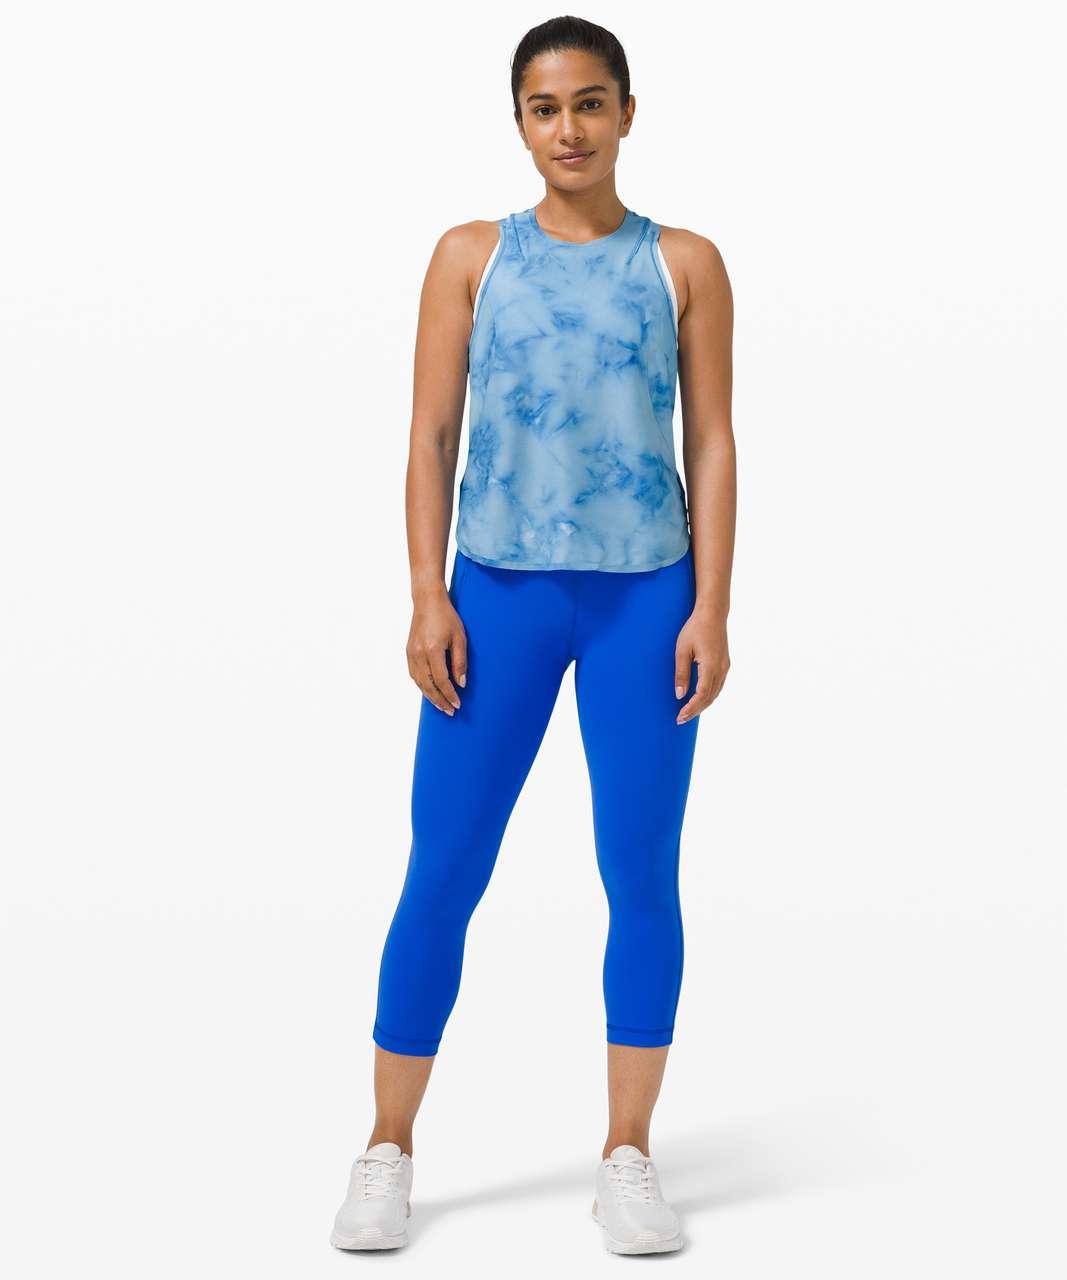 Lululemon Lightweight Run Kit Tank Top - Tidal Dye Vapor Hawaiian Blue